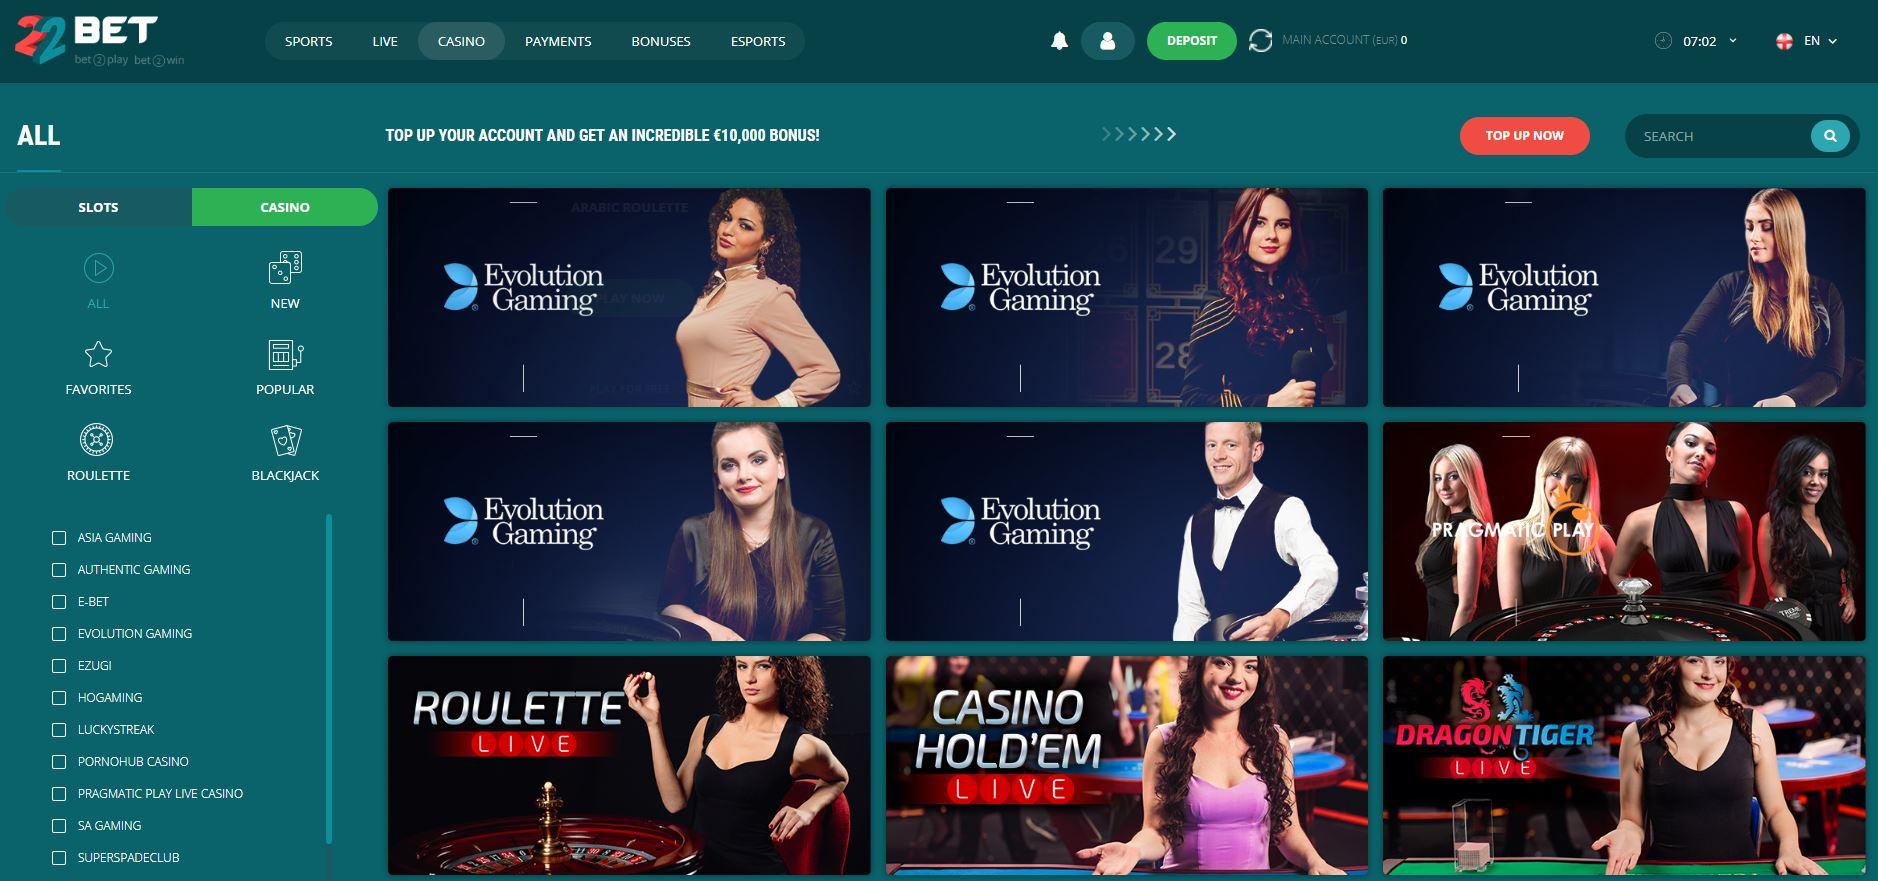 22Bet Casino lobby